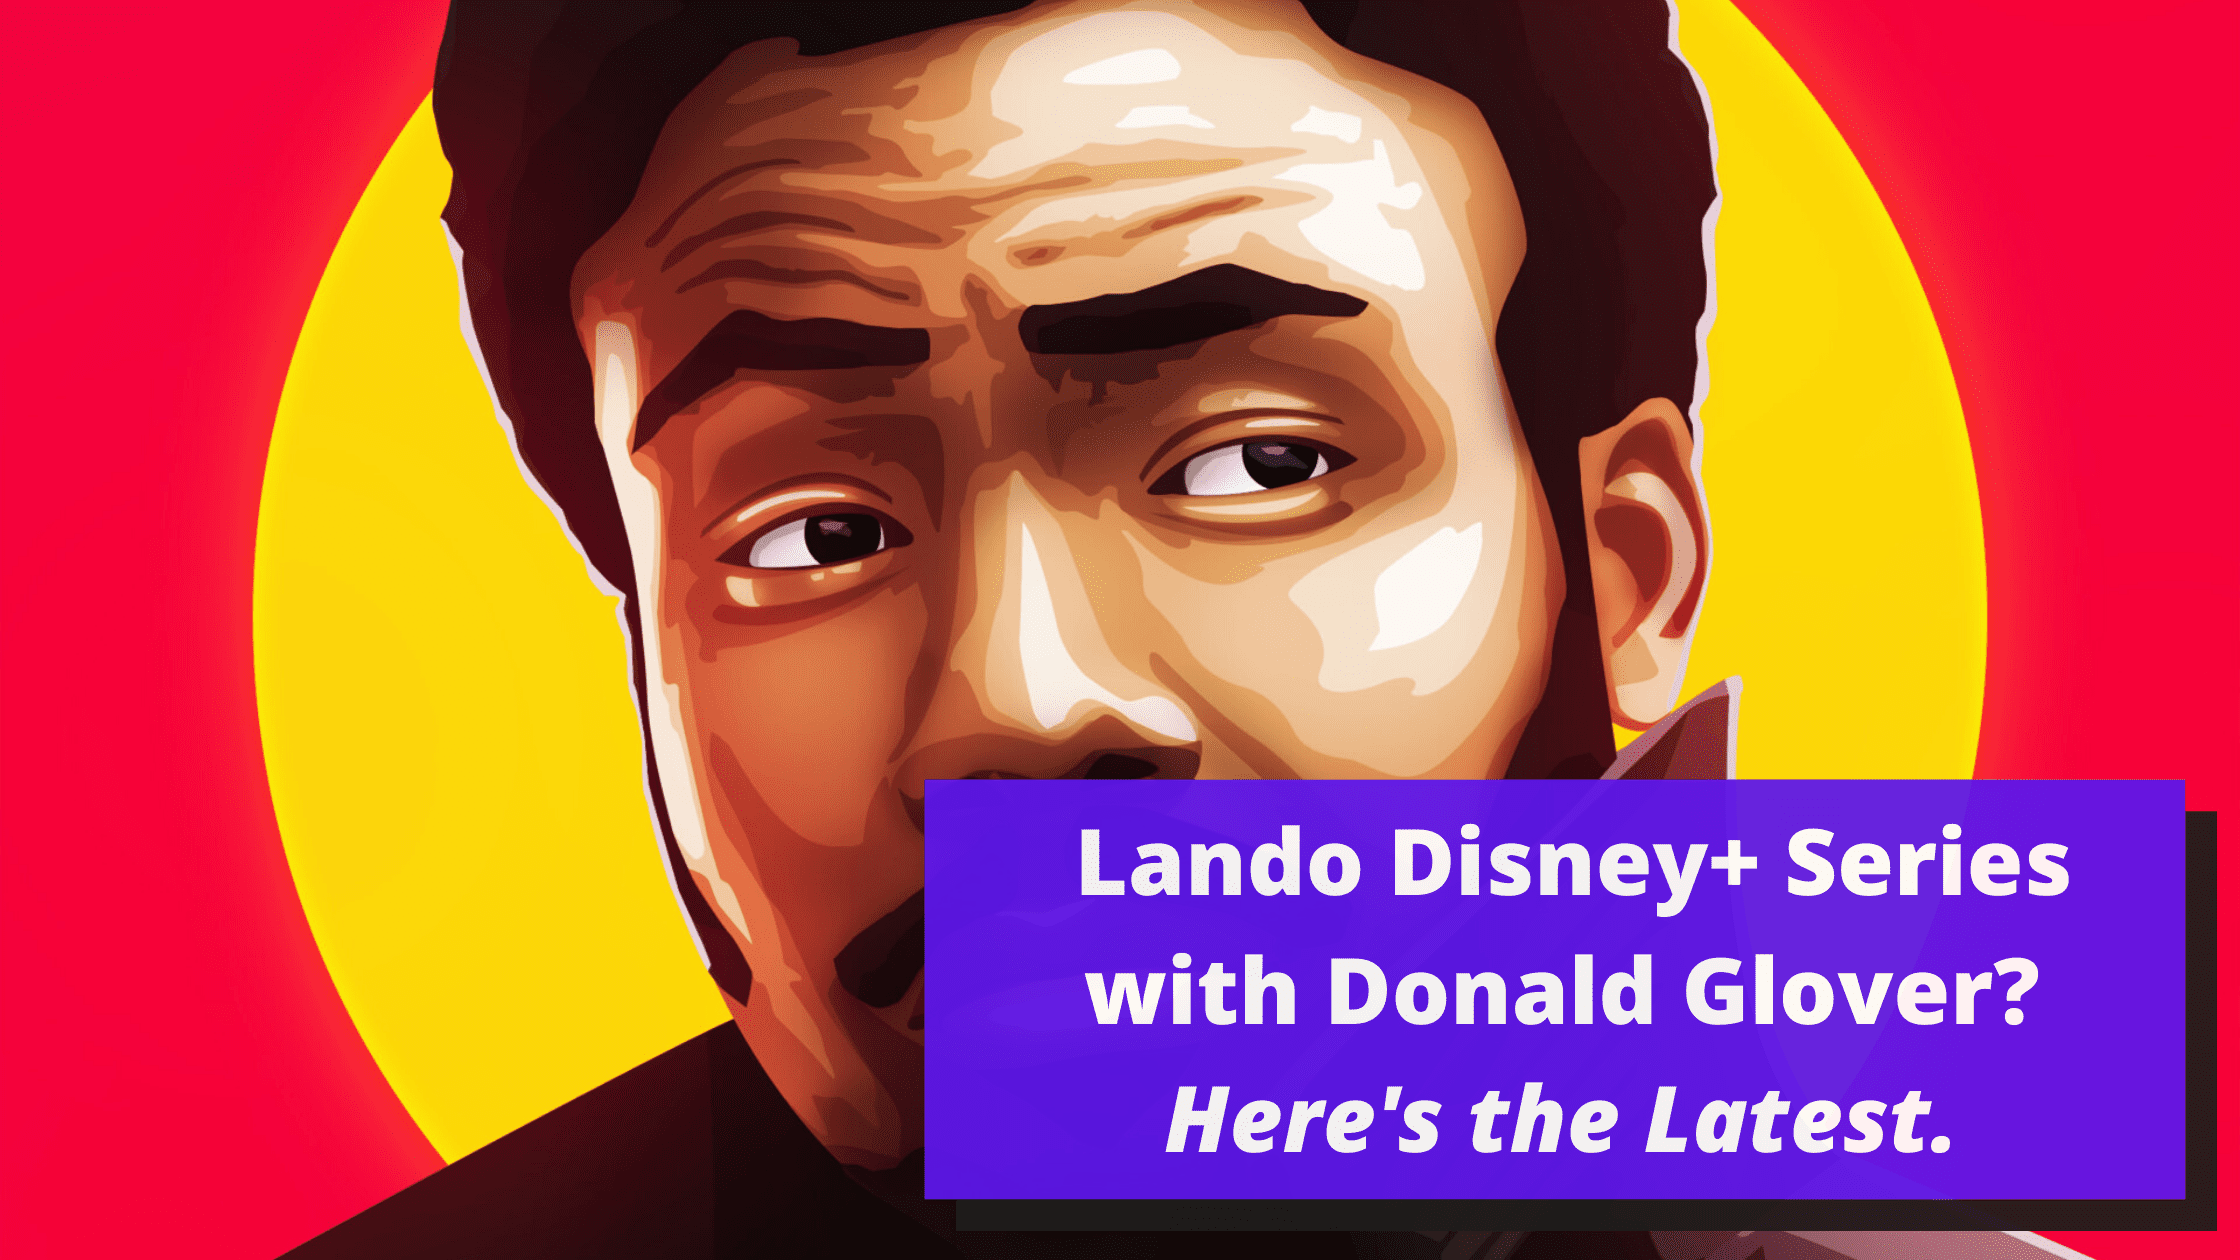 Lando-Disney-Plus-Series-with-Donald-Glover-Heres-the-Latest